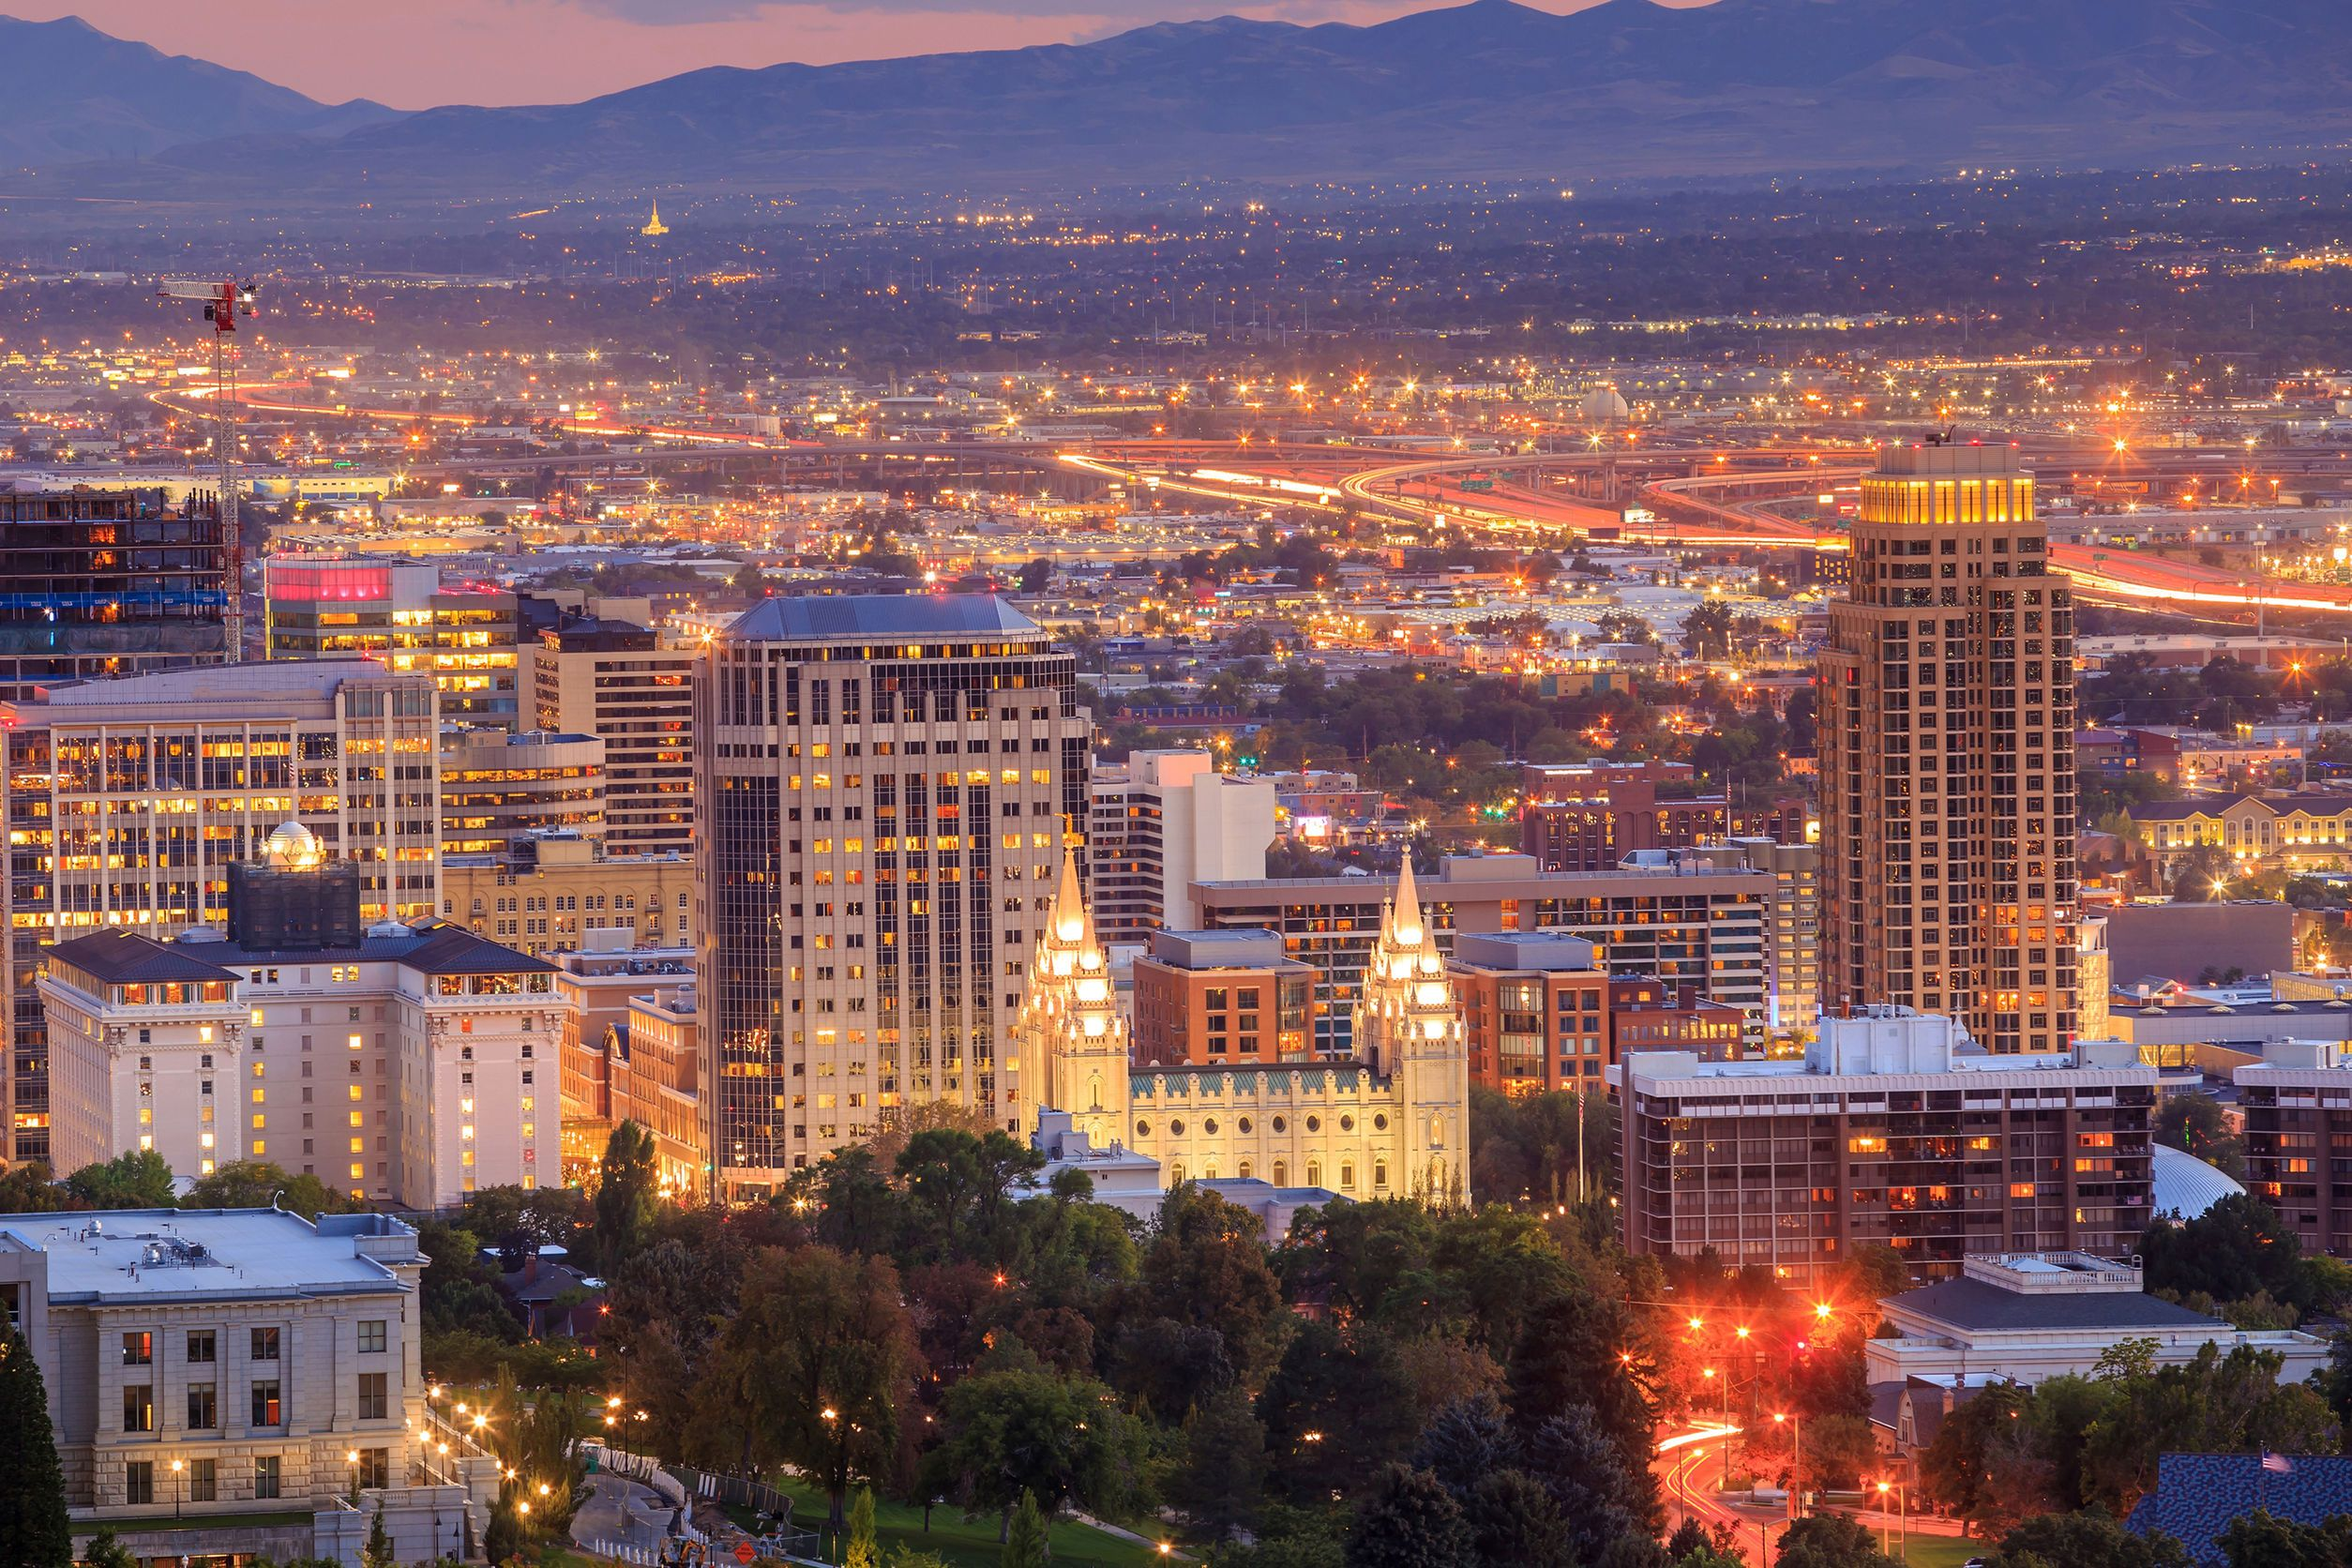 Utah launches CBD probe, but some retailers unfazed